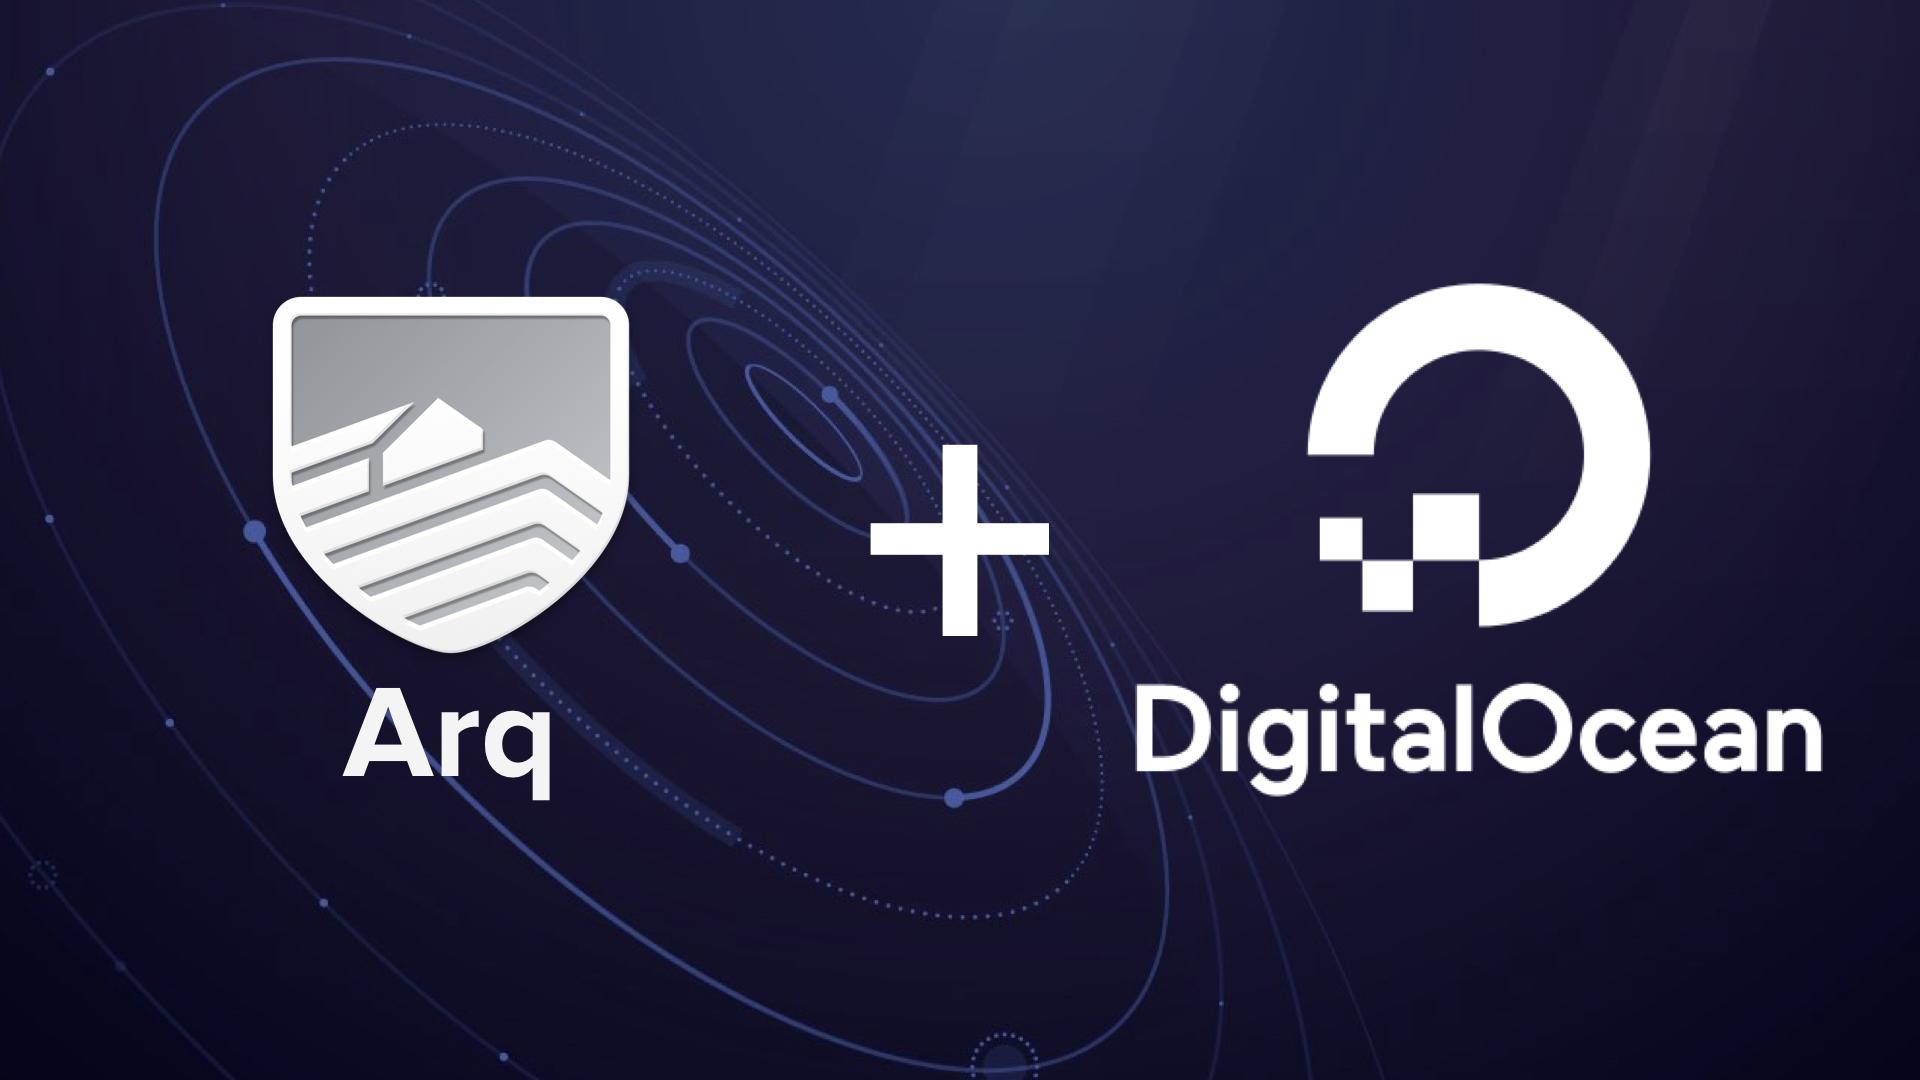 Configure Arq to backup to DigitalOcean Spaces